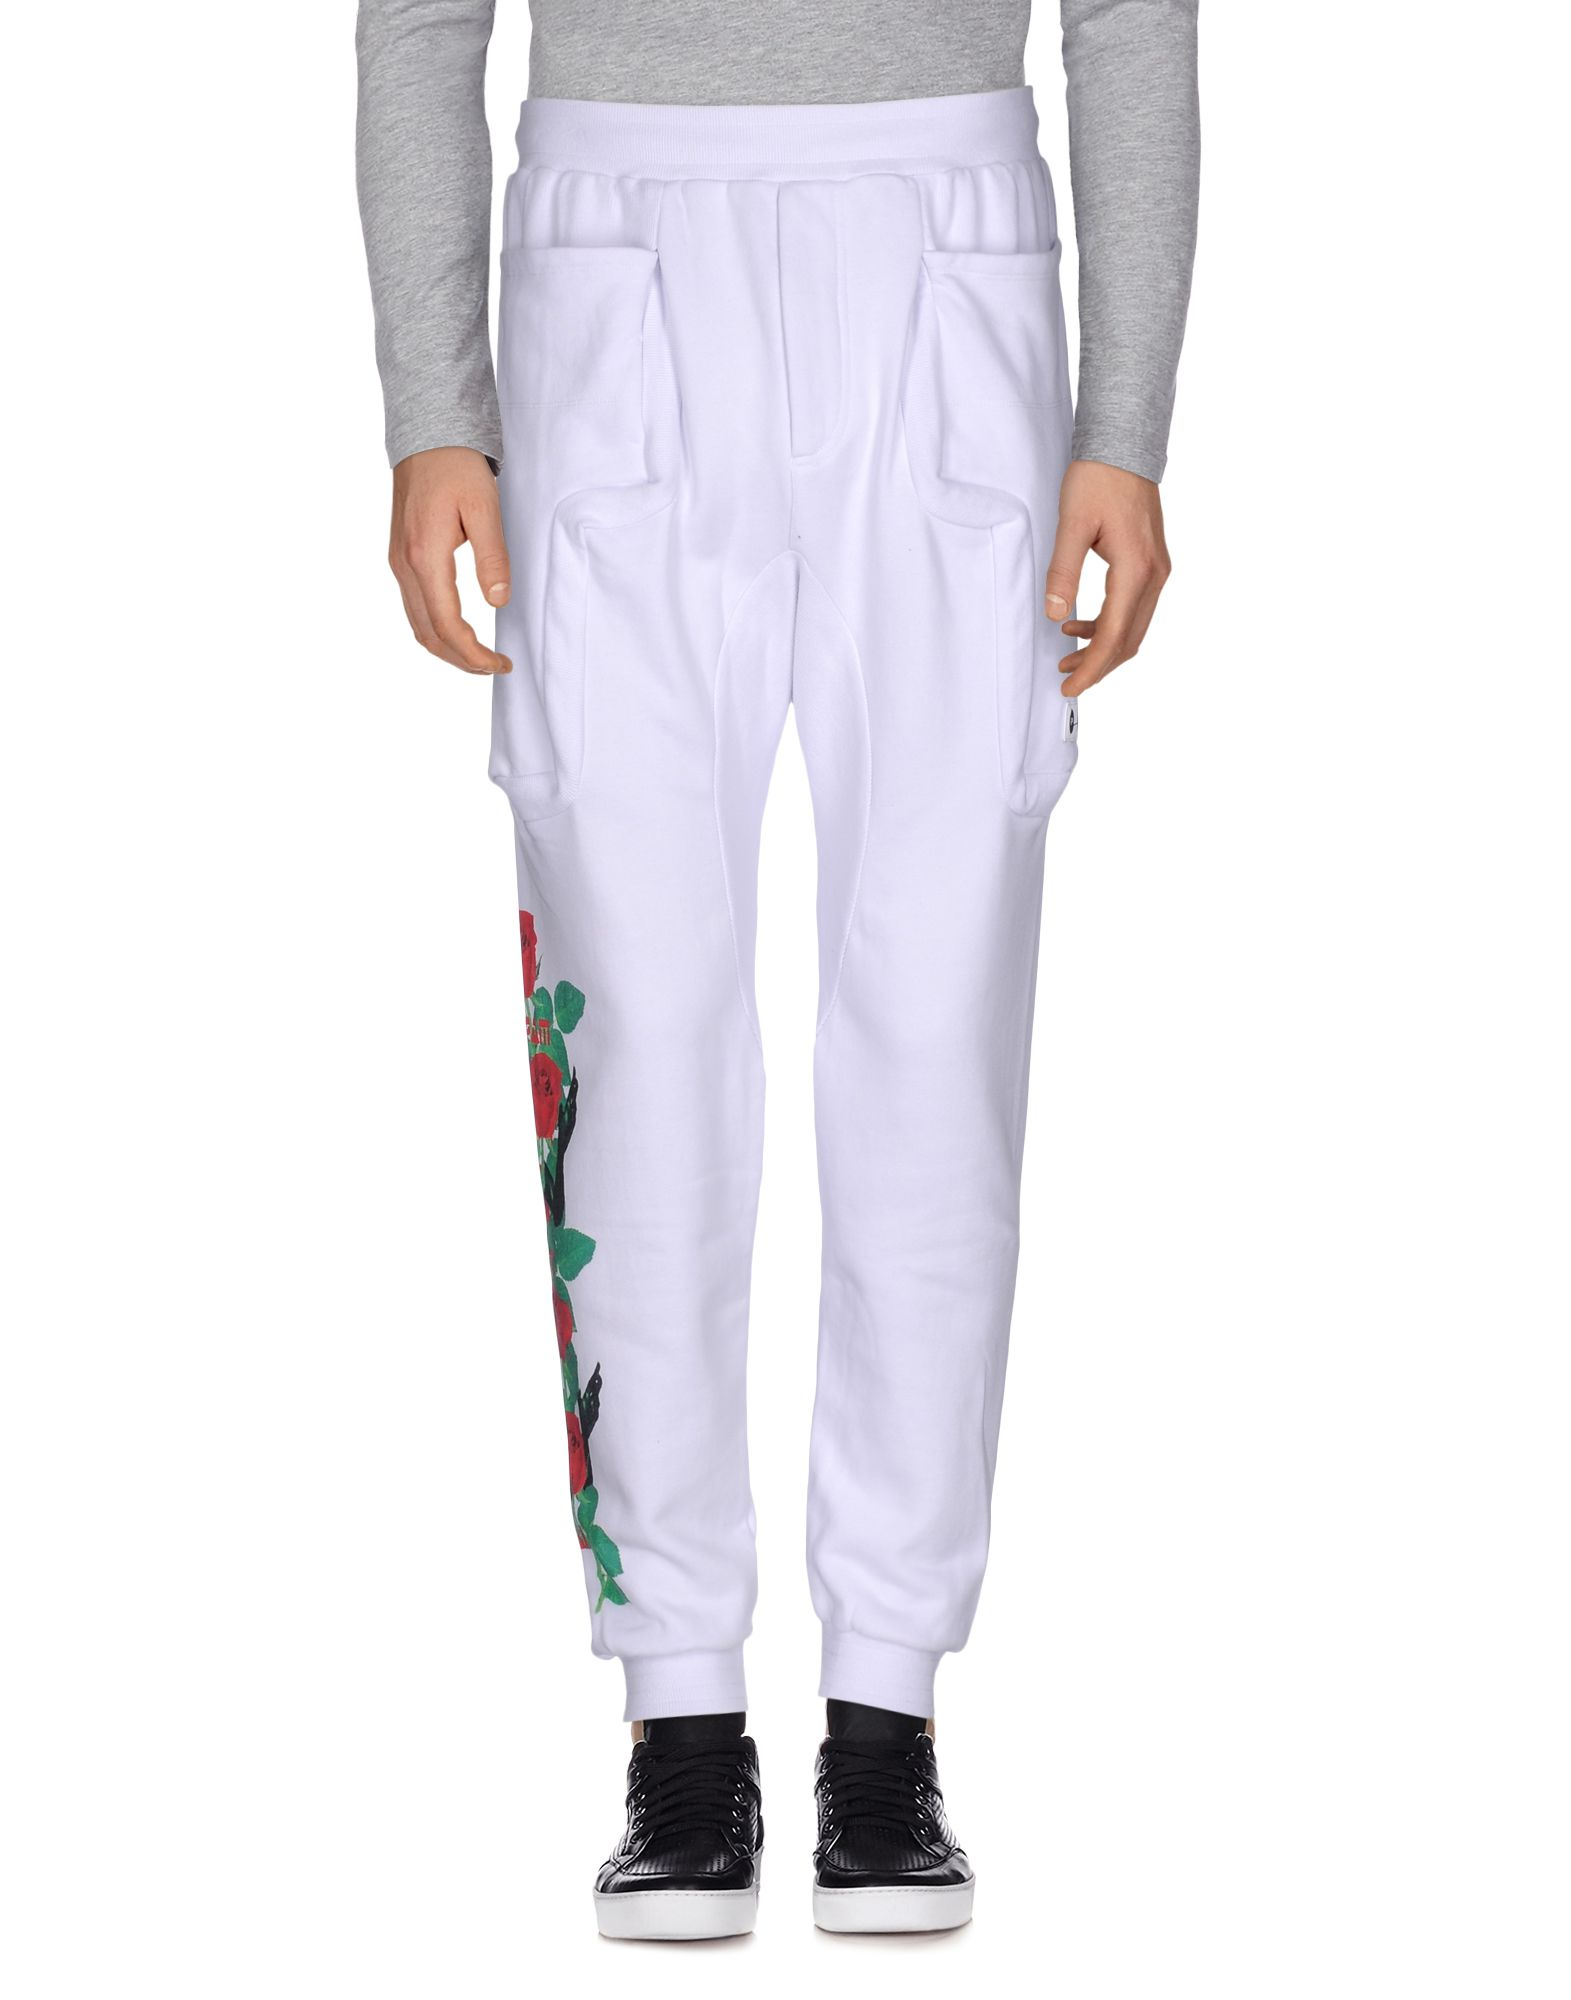 Pantalone Pam Uomo - Acquista online su